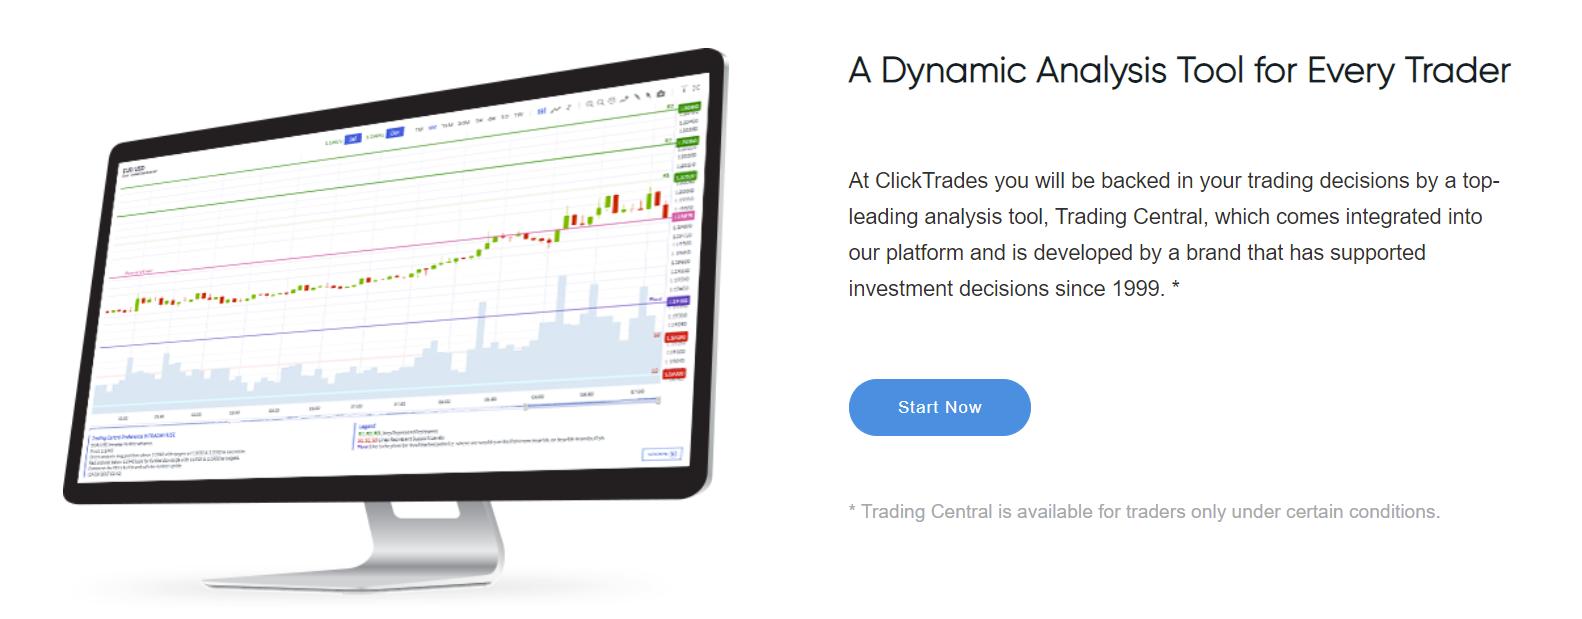 ClickTrades Trading Central